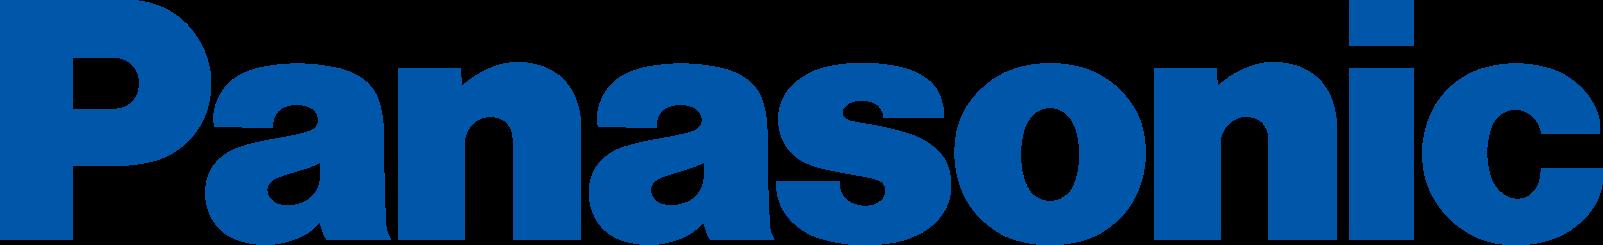 panasonic logo 2 - Panasonic Logo